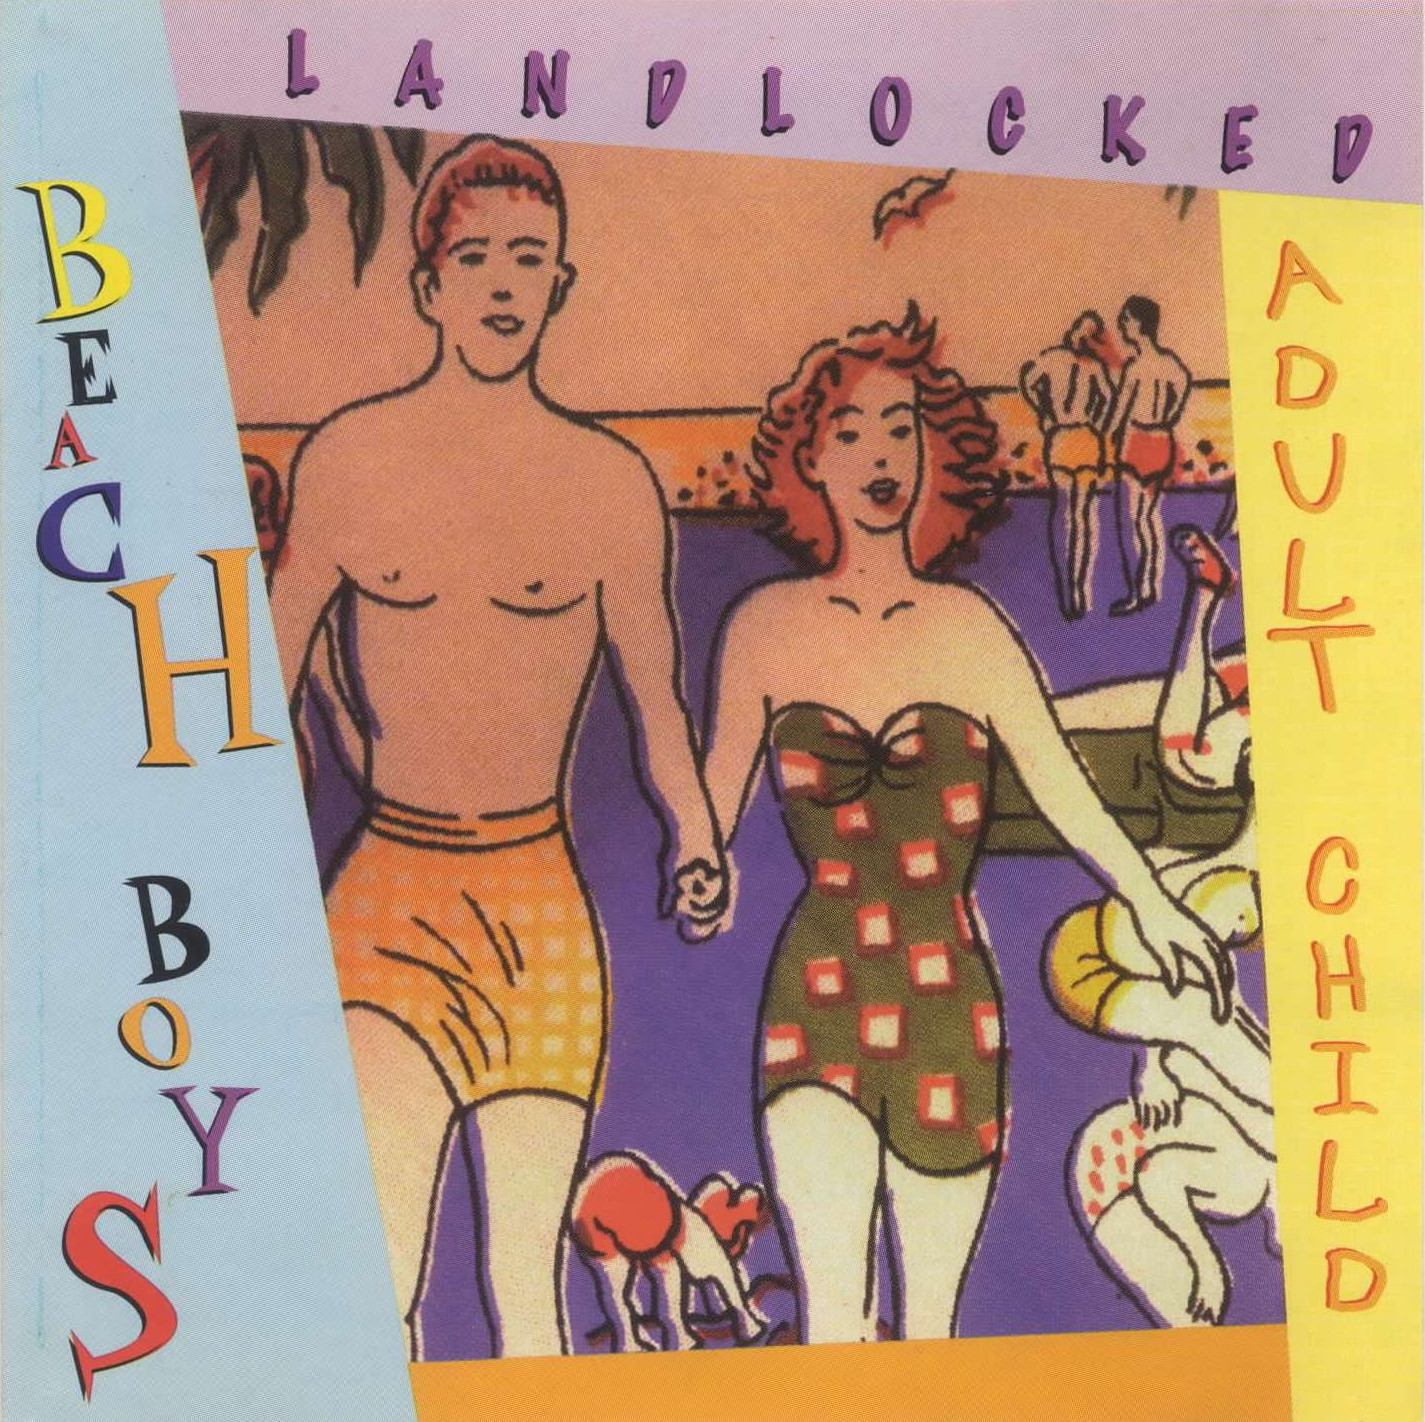 Landlocked / Adult Child cover